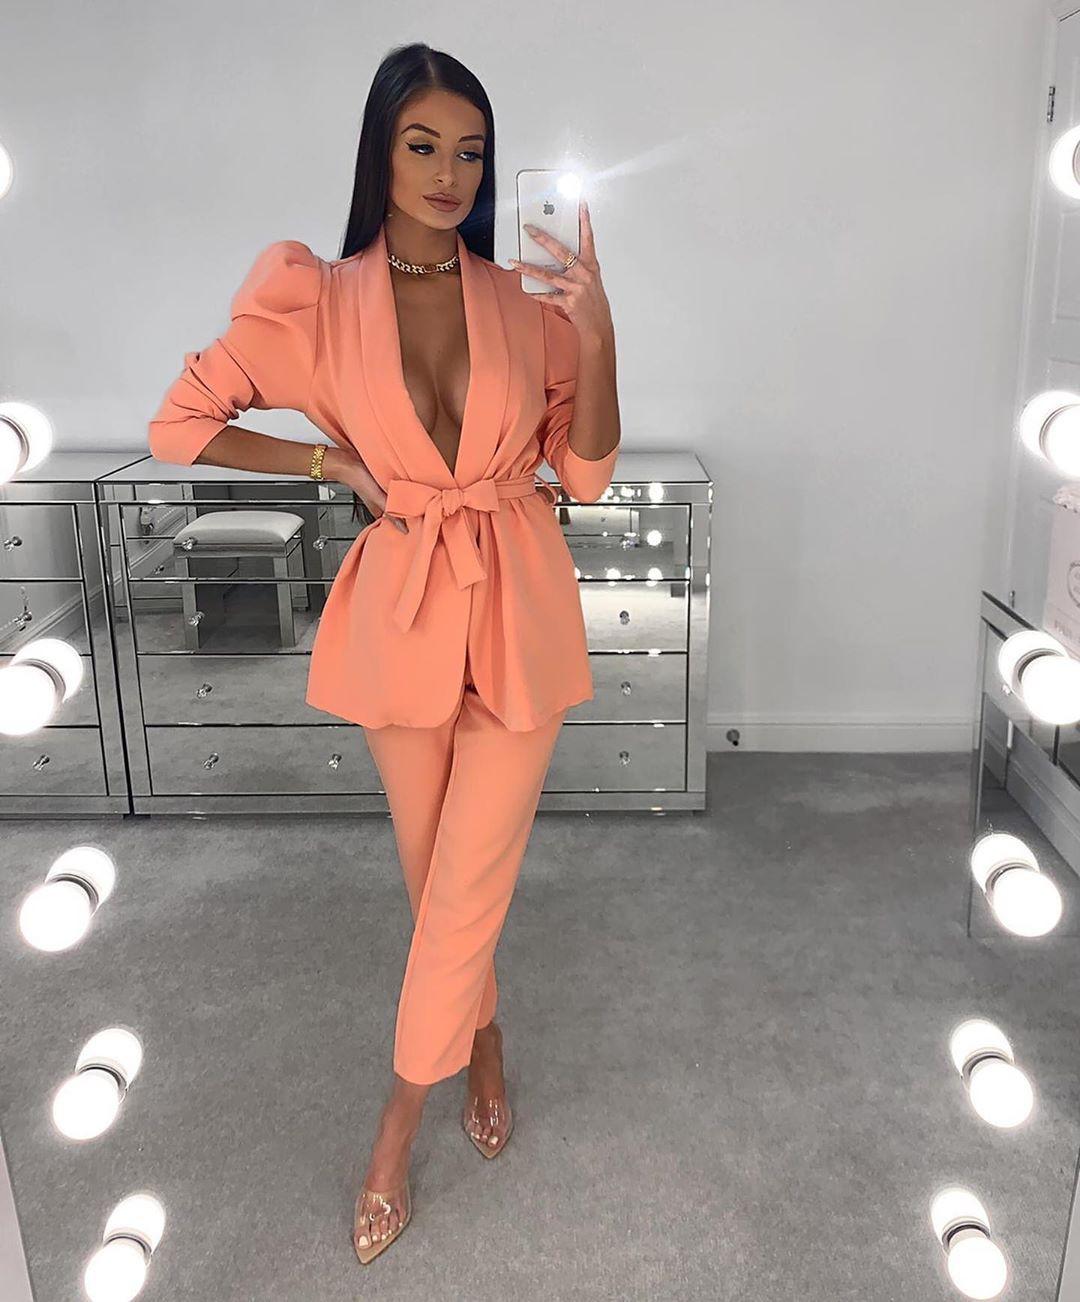 Orange and pink formal wear, pantsuit, fine legs